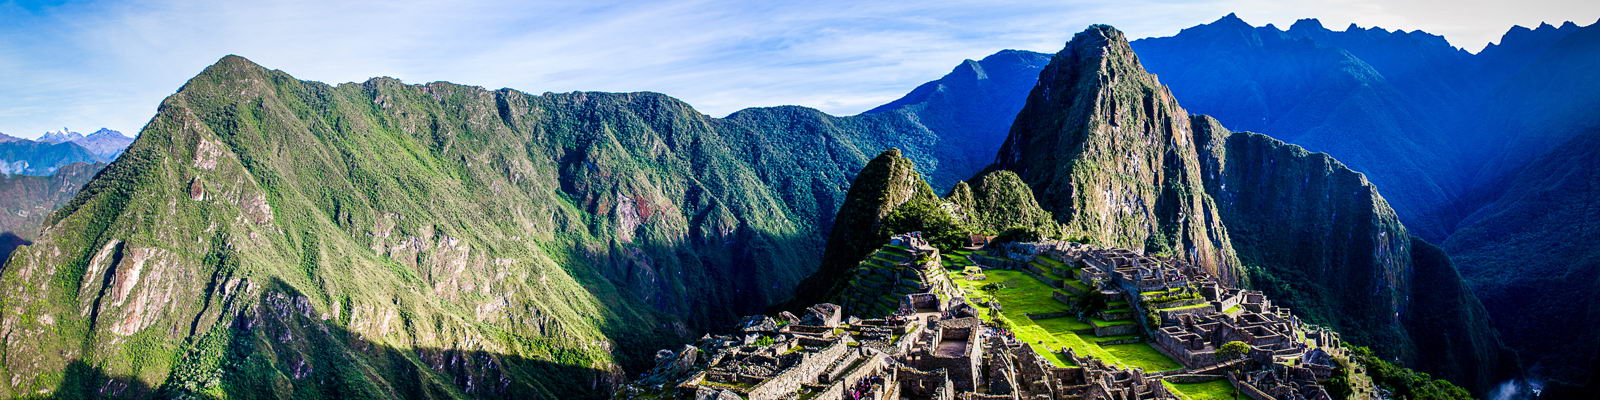 Machu Picchu Santuario Histórico De Machu Picchu Perú Travel